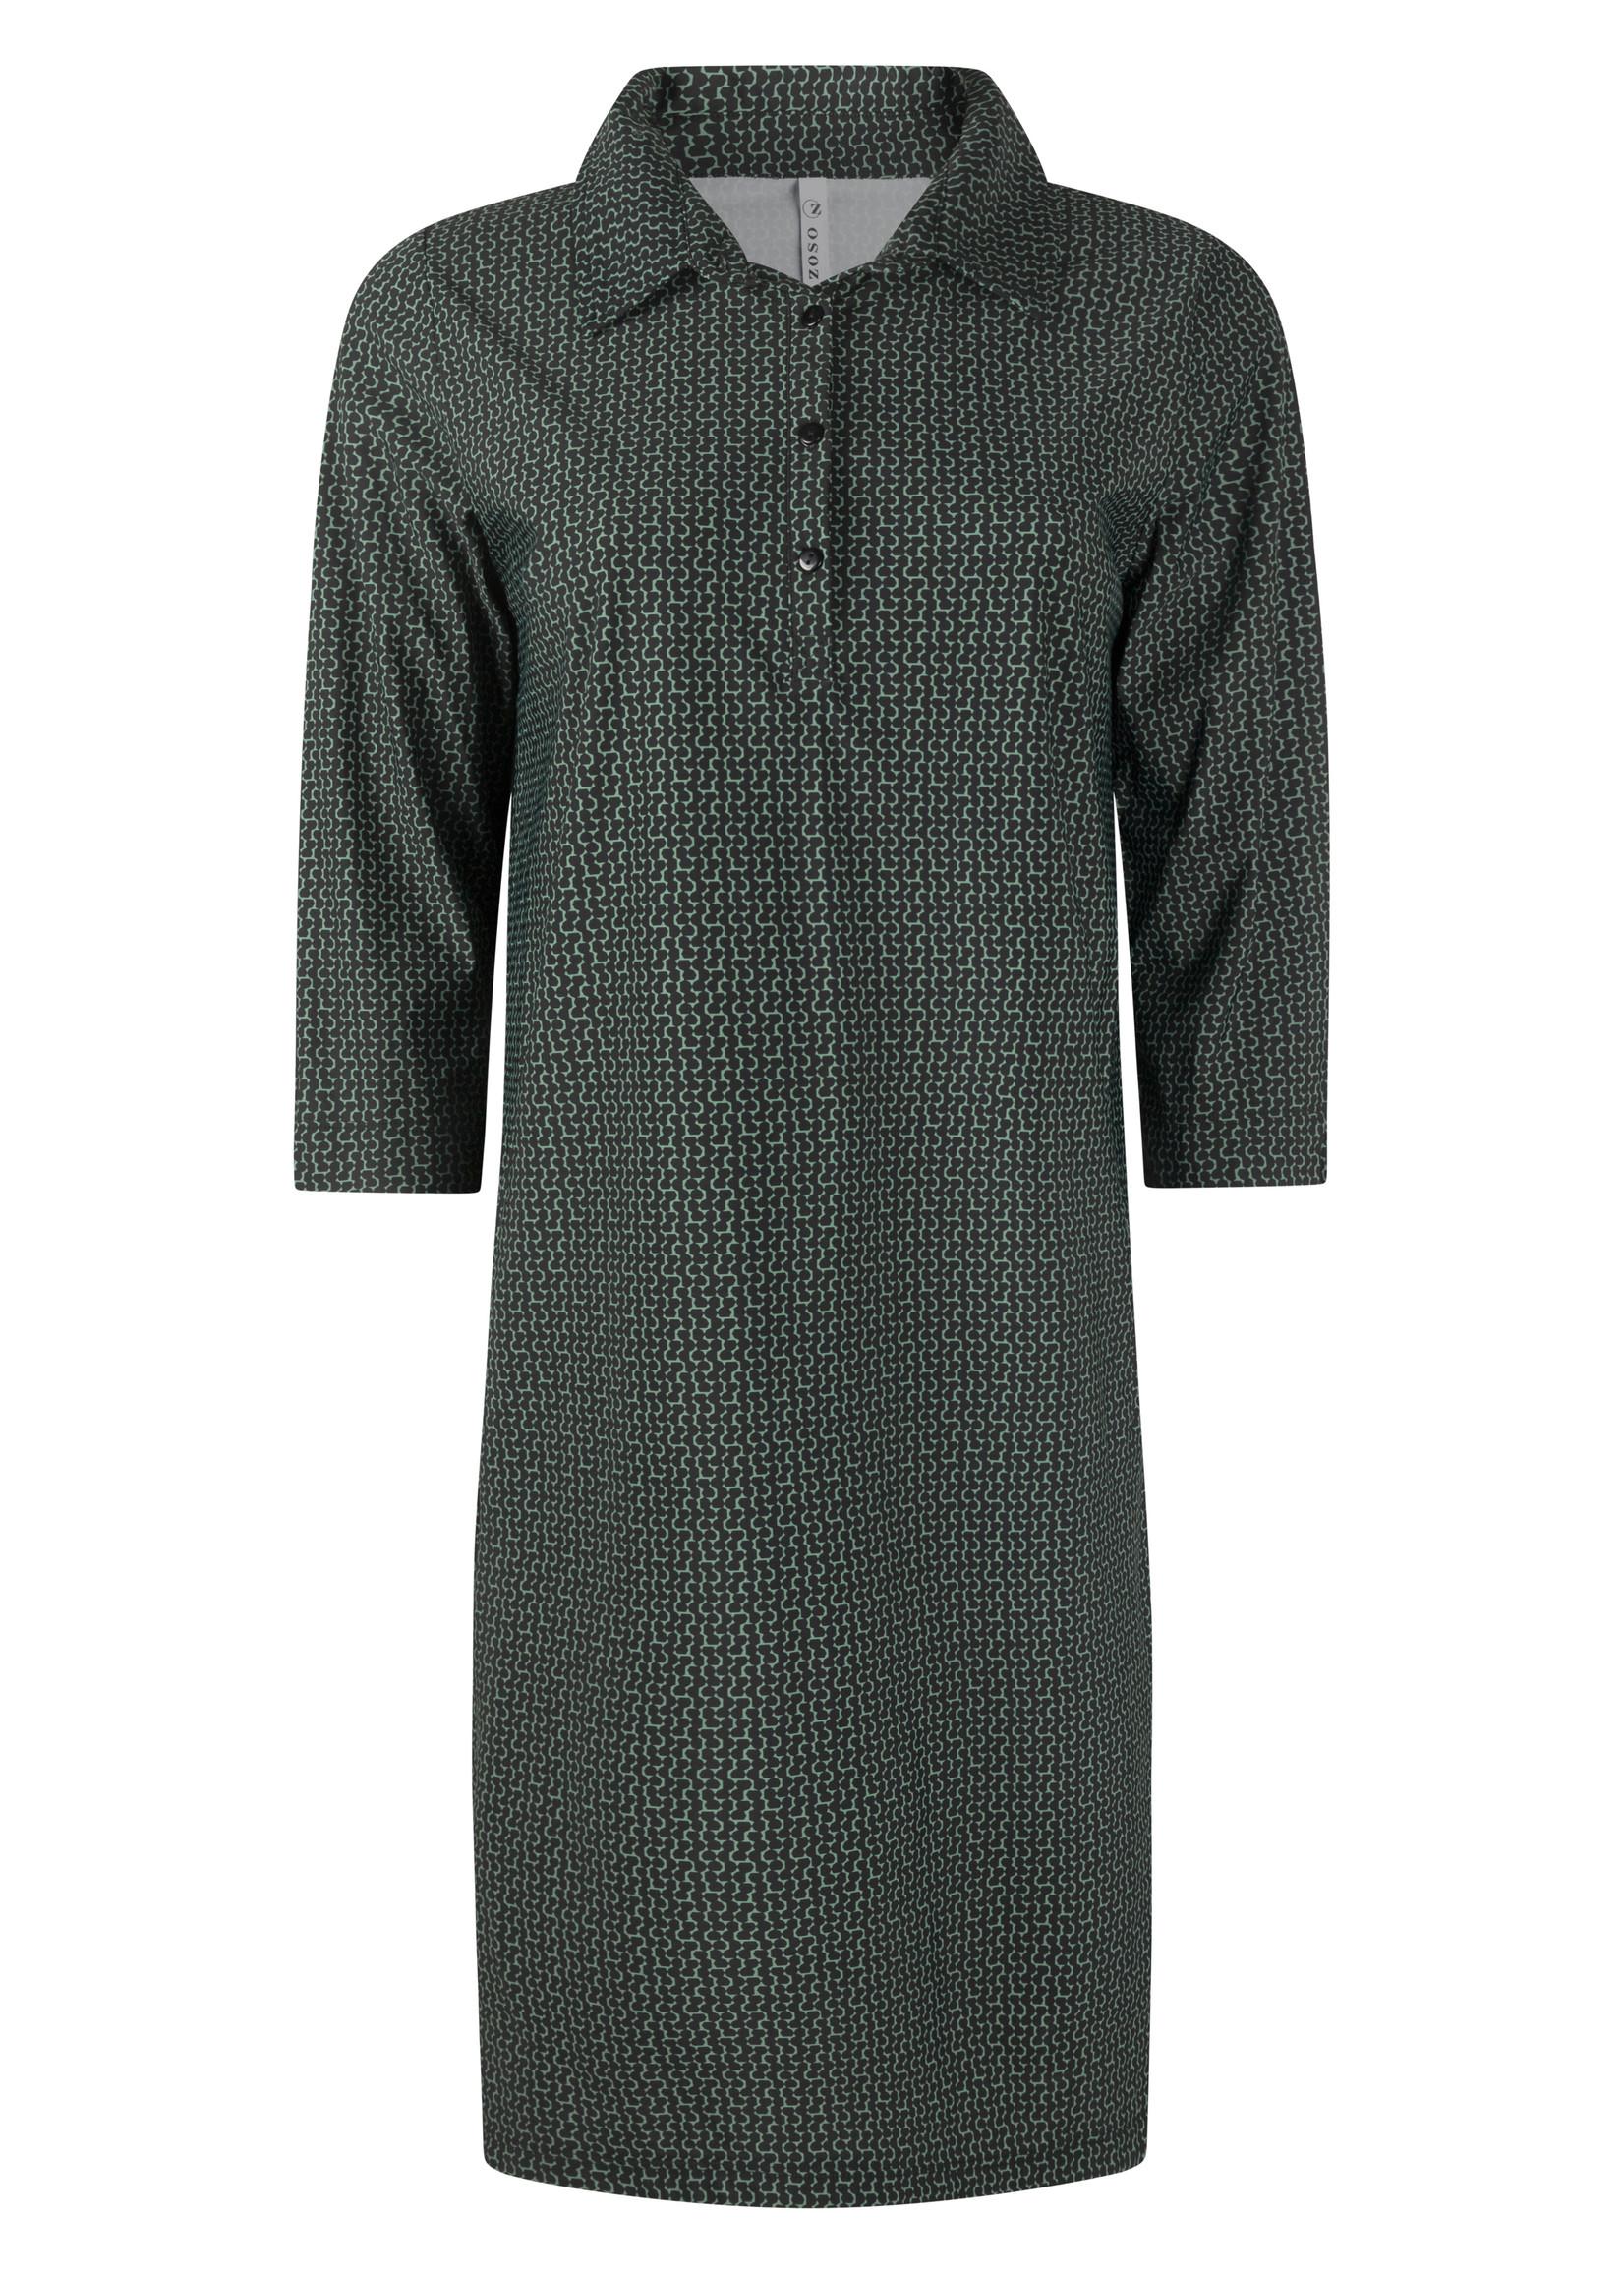 Zoso Zoso - Veronique - travel jurk - allover printed